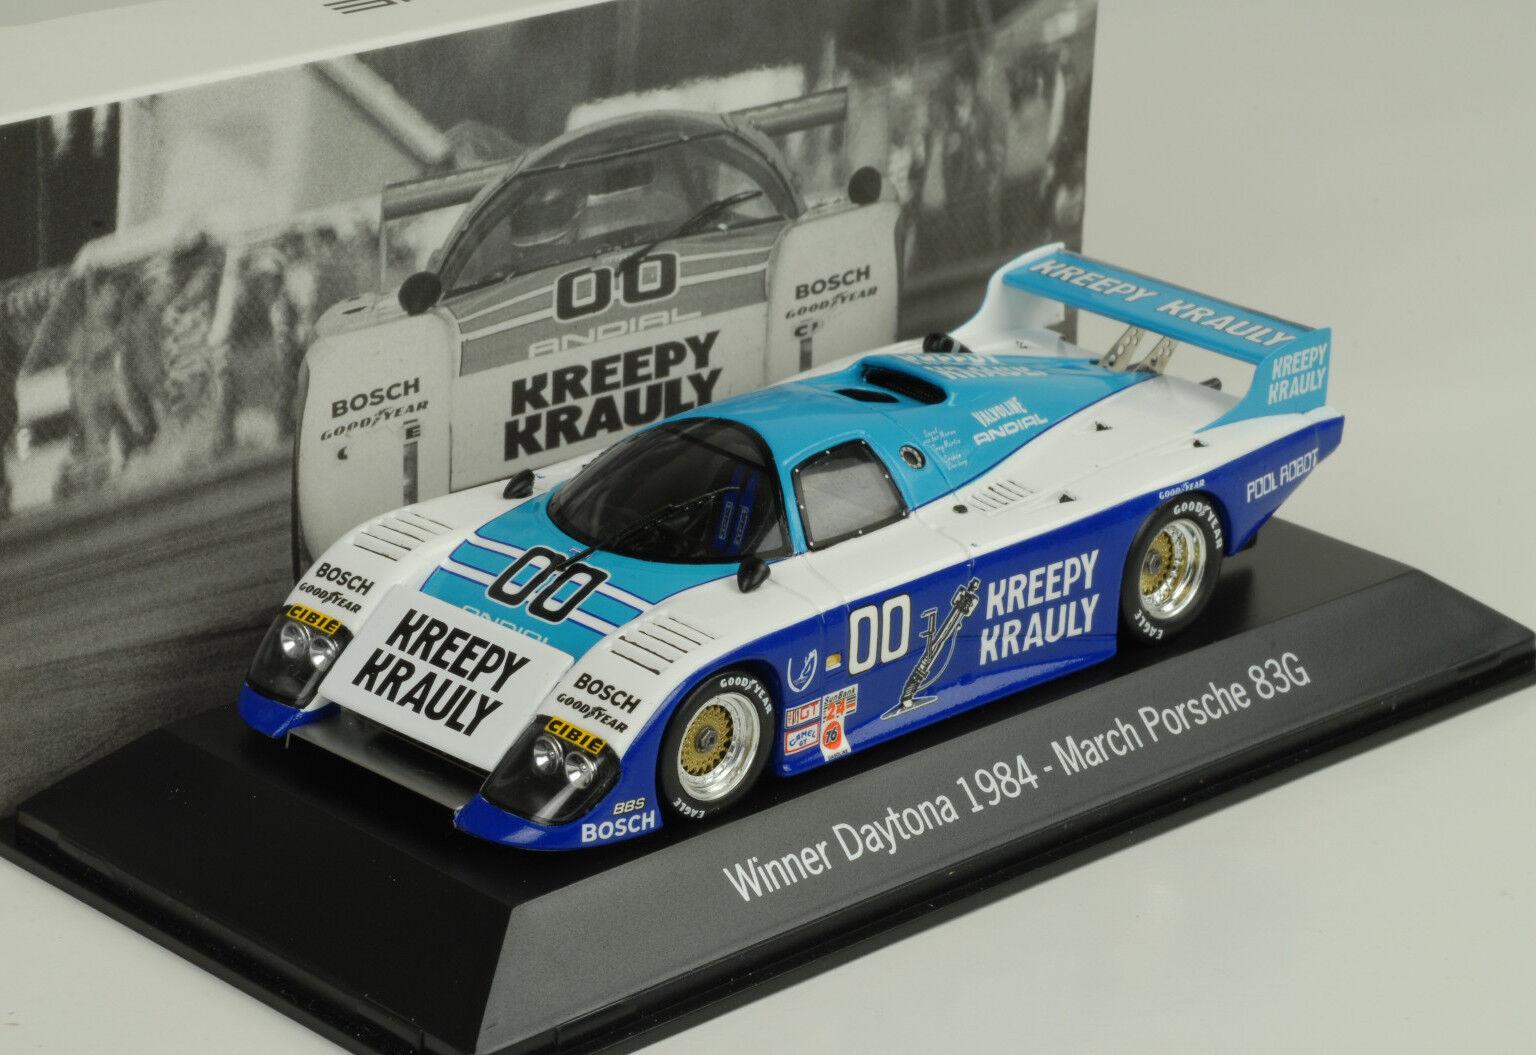 March Porsche 83G Kreppy  00 Vincitore Daytona 1984 1:43 Map Museo Spark